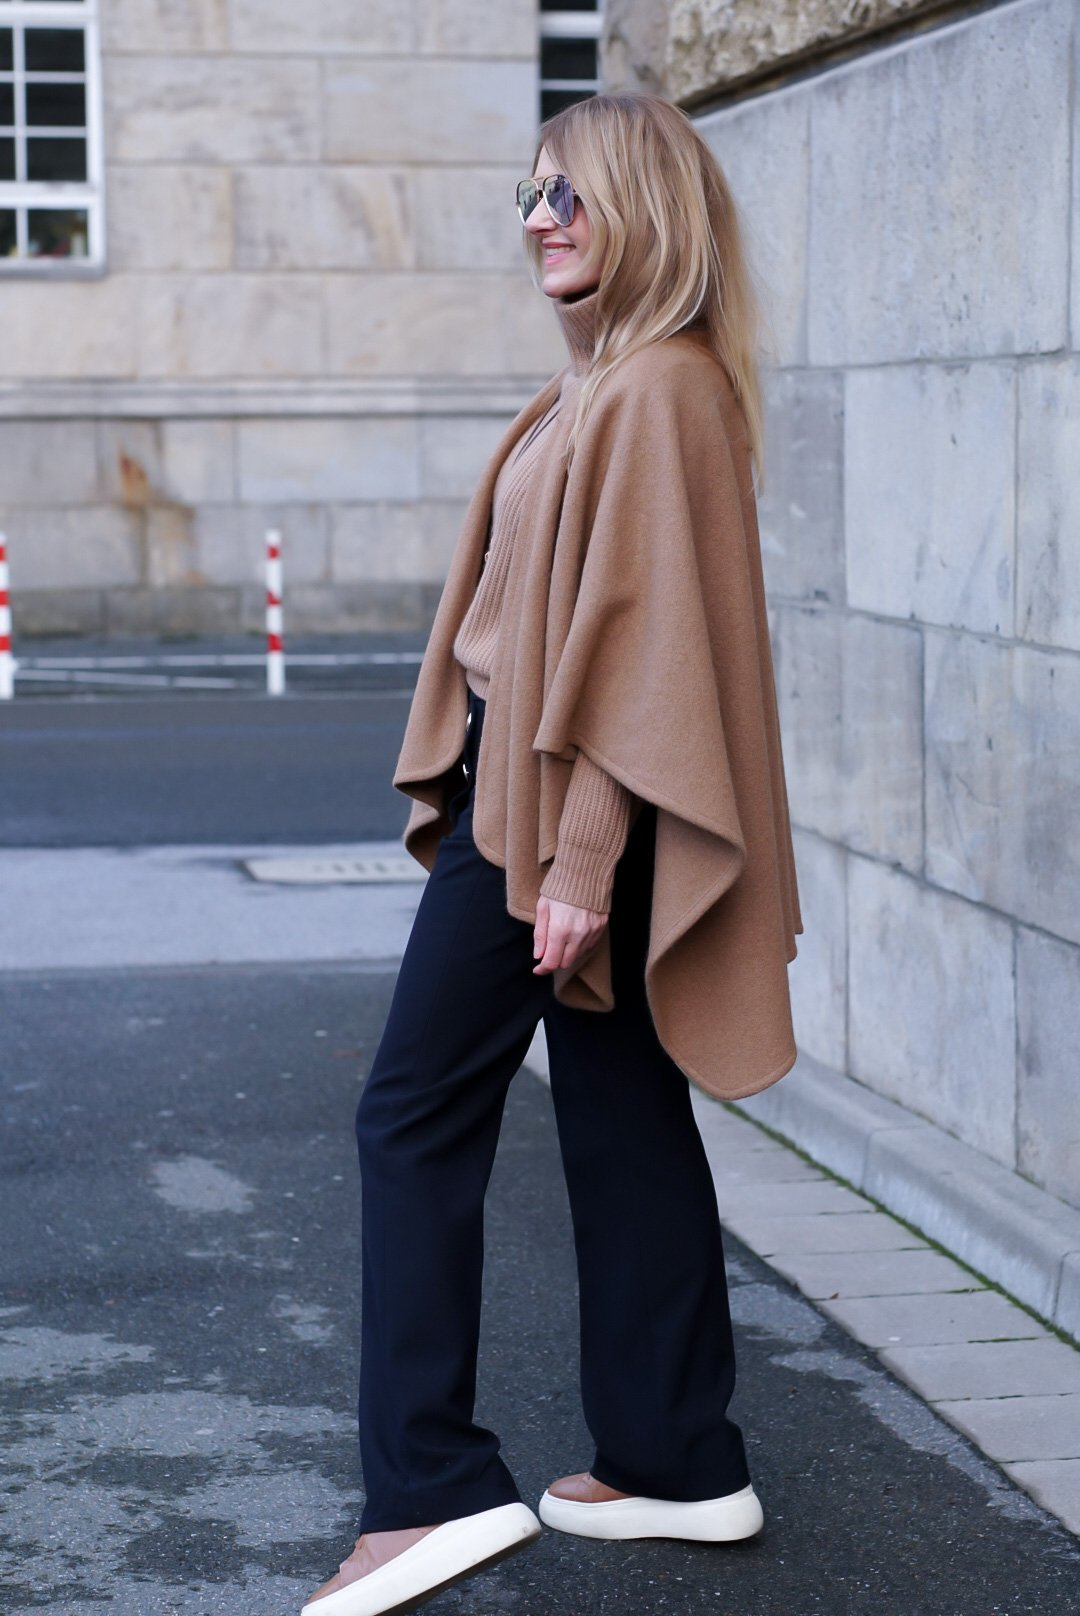 Howahrde-Fashion-Seductive-Hose-Lisa-Yang-Kaschmir-Pullover-Santoni-Sneaker